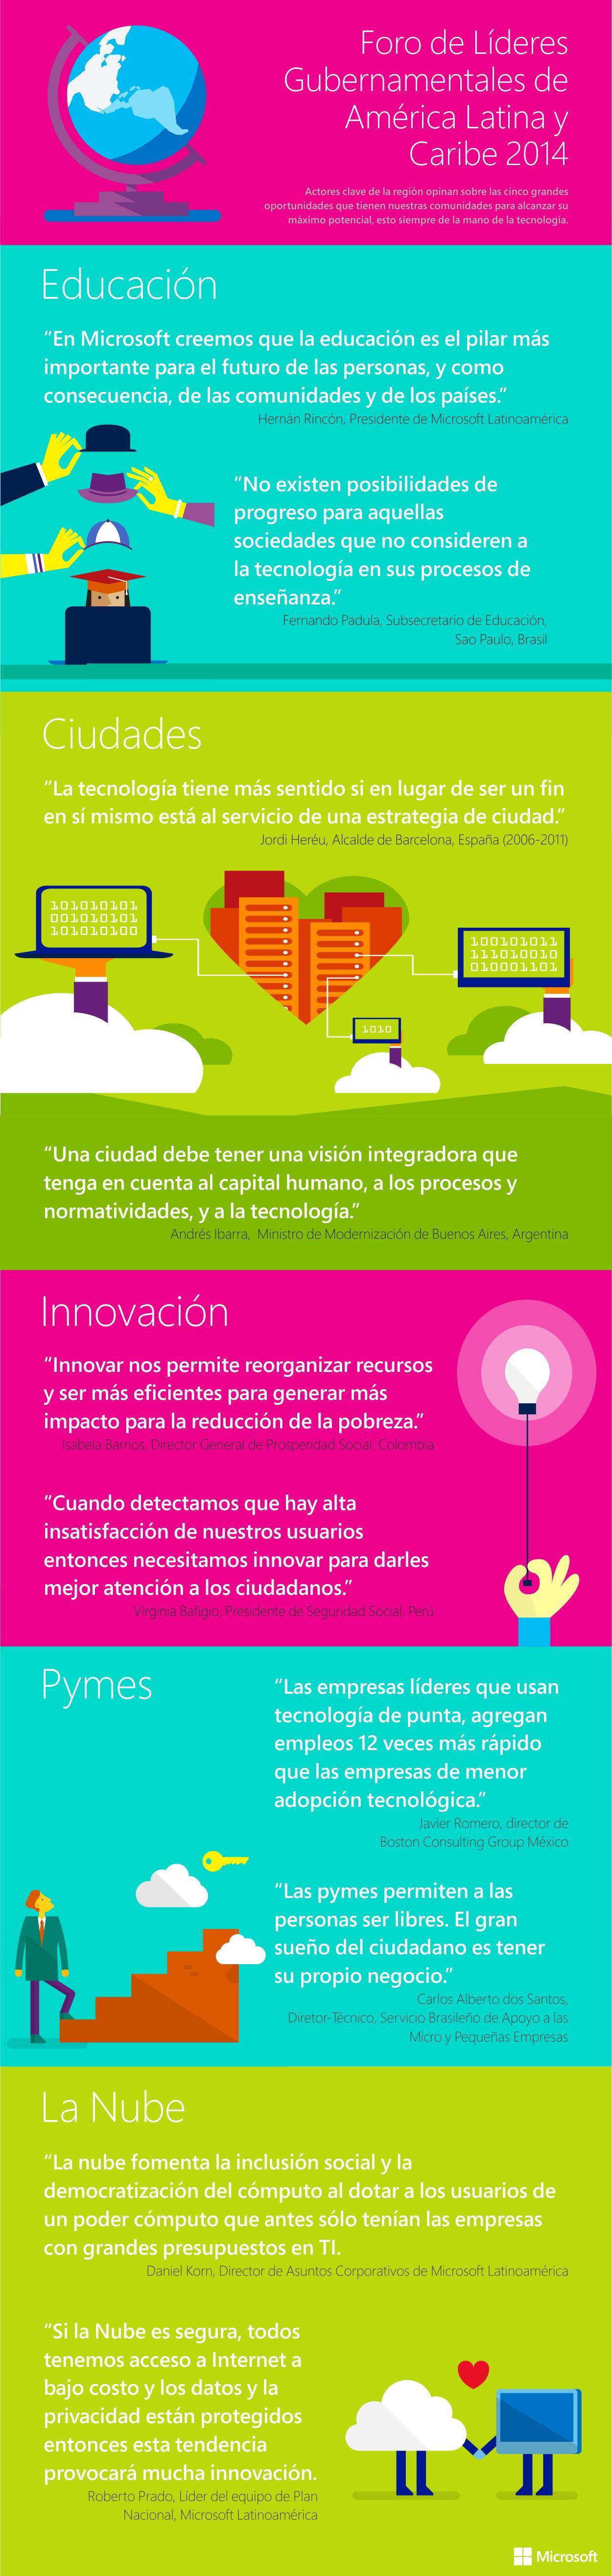 GLF2014_Quotes-Infographic_Print